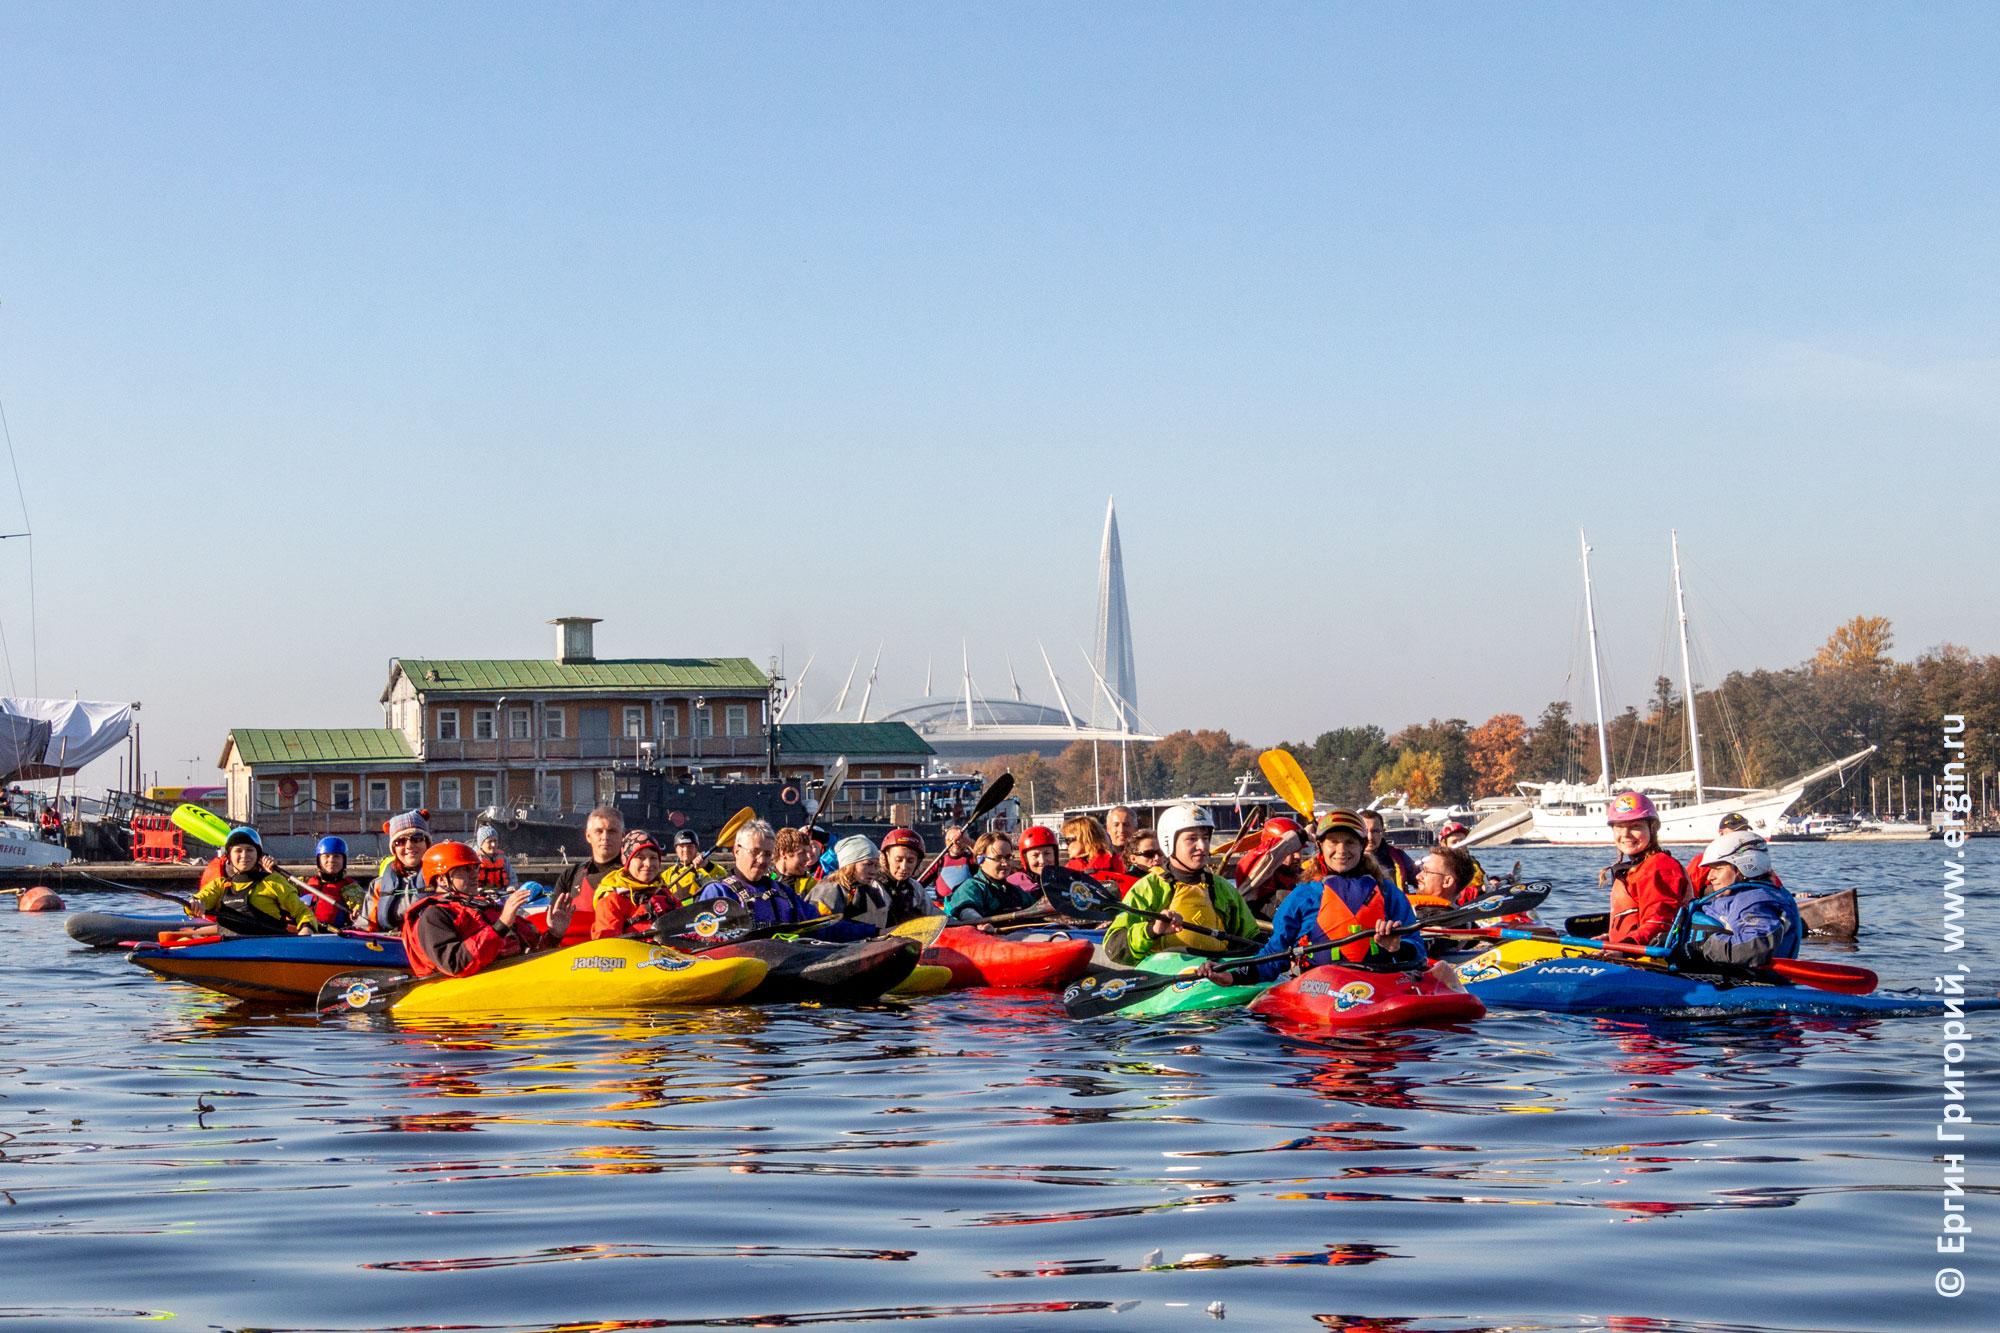 Каякеры с каяками и веслами на воде на фоне башни Газпрома и стадиона Санкт-Петербург